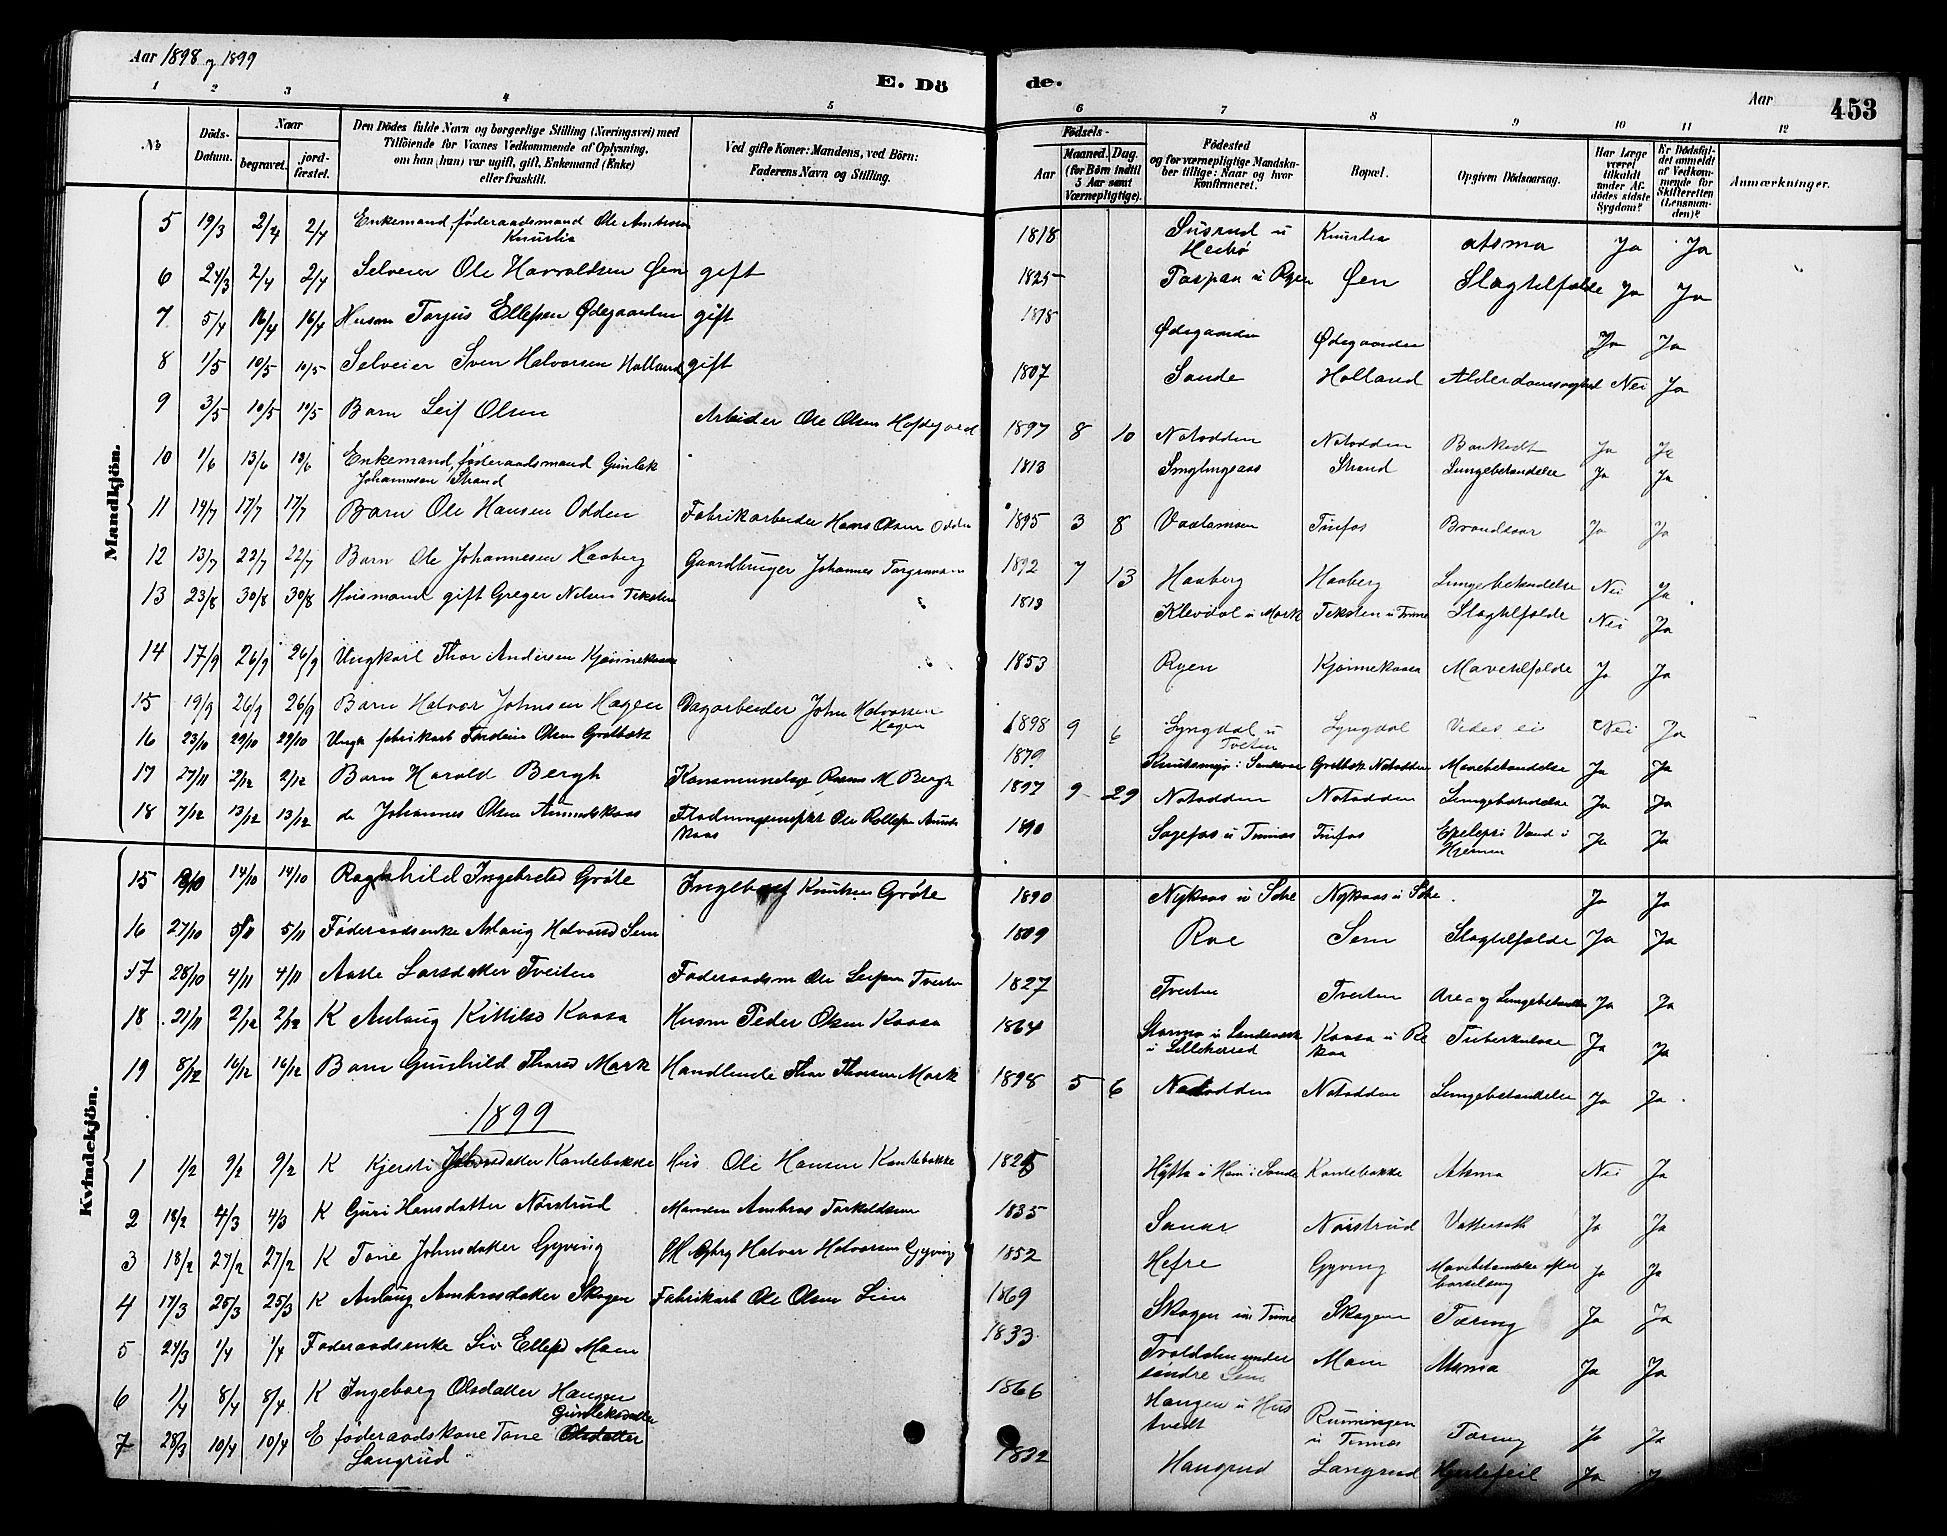 SAKO, Heddal kirkebøker, G/Ga/L0002: Klokkerbok nr. I 2, 1879-1908, s. 453